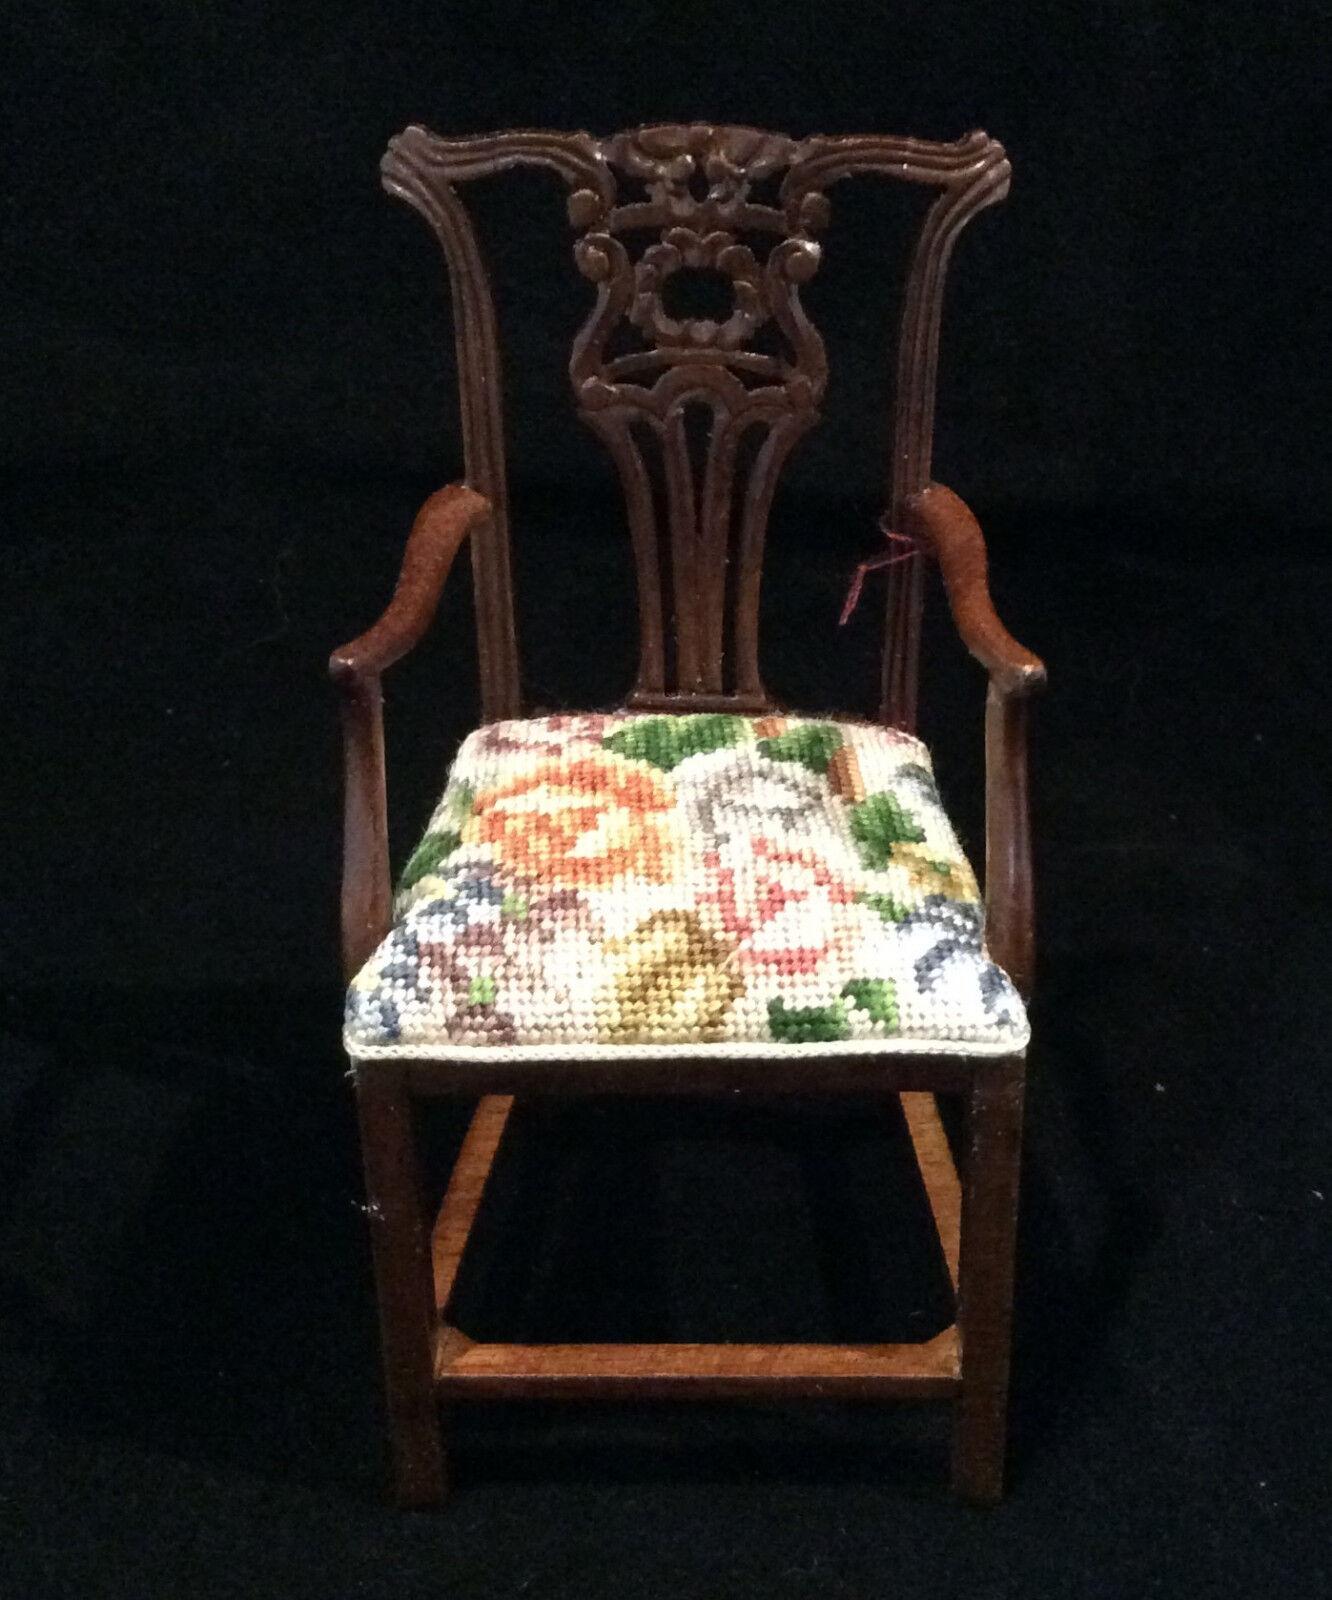 JBM Miniature Dollhouse Arm Chair with floral petit point  - needlepoint.  2018 dernier